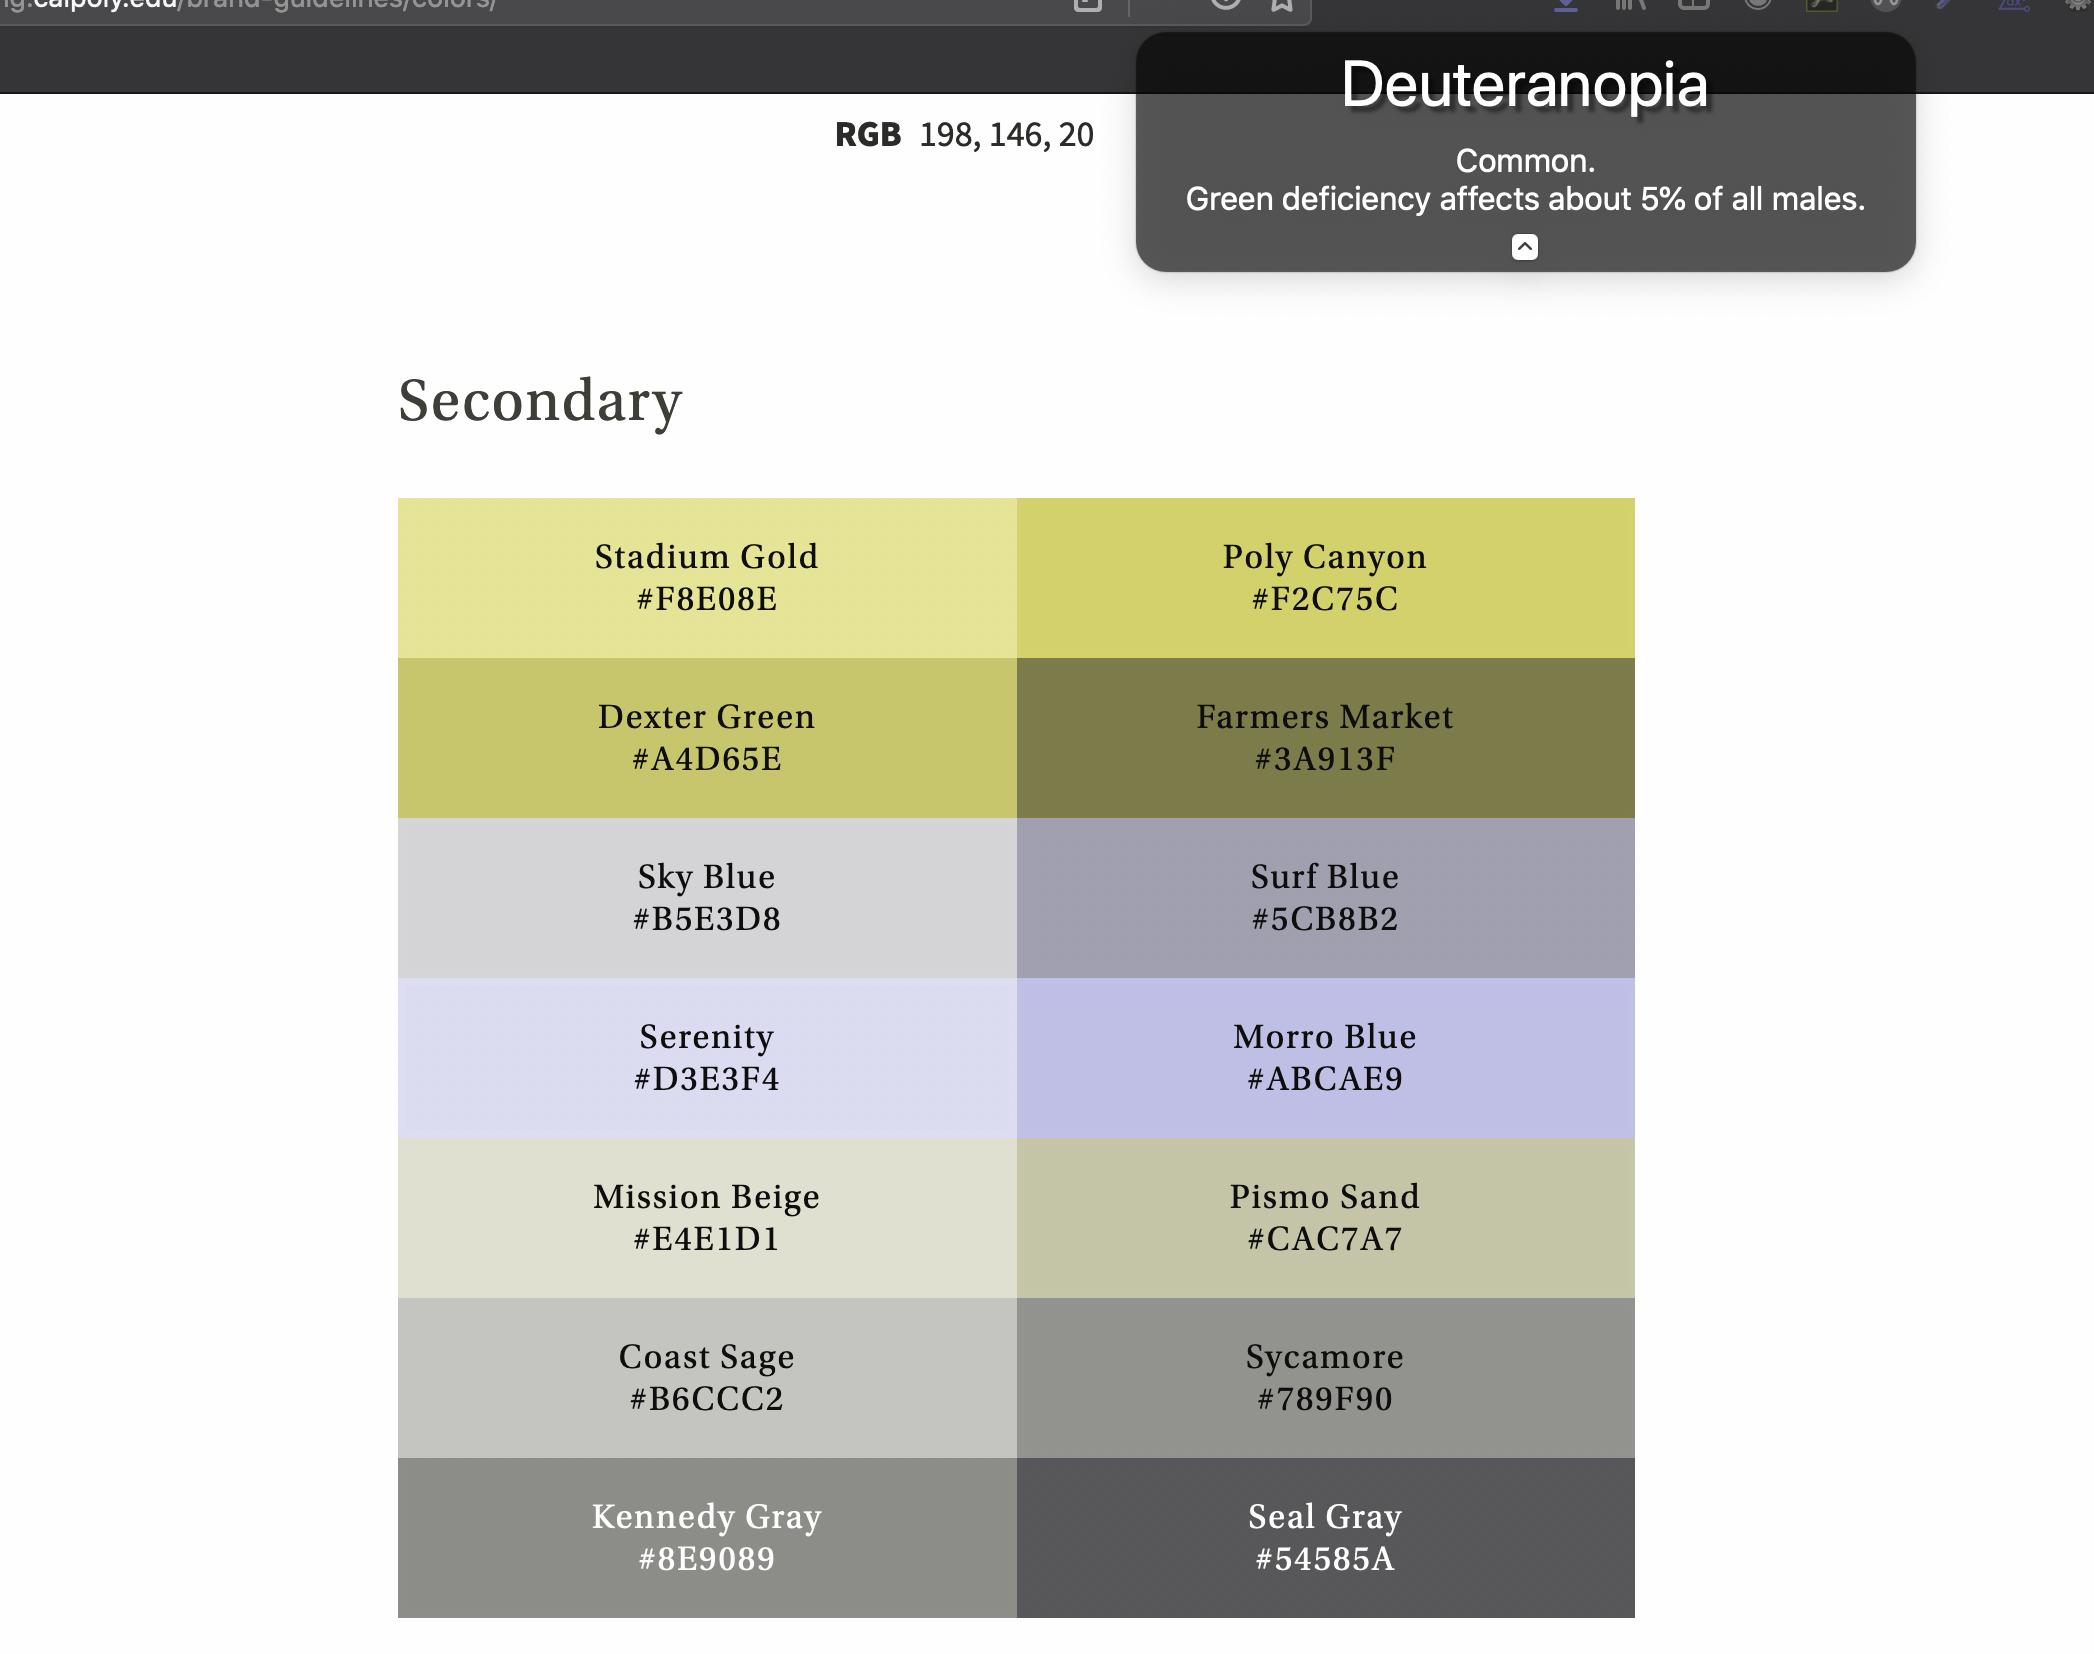 deuteranopia version of Cal Poly brand colors